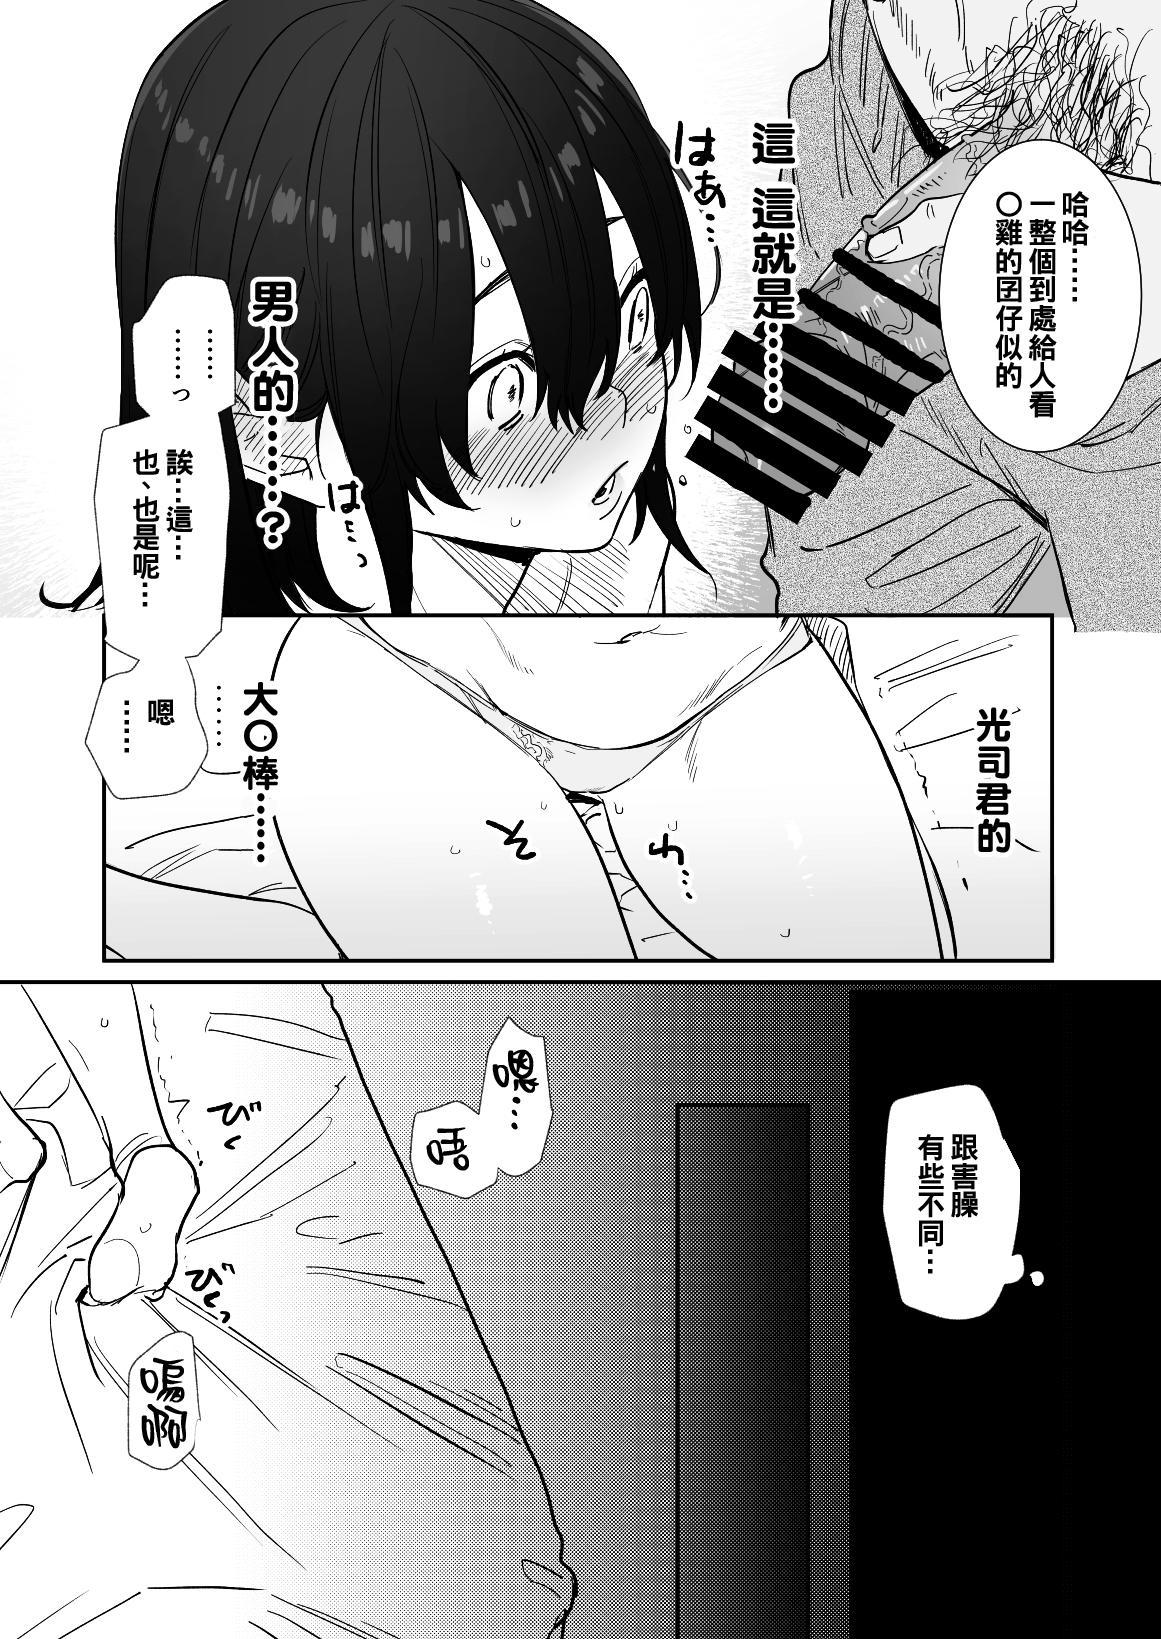 〇sen Yen de Oppai Misete. 18